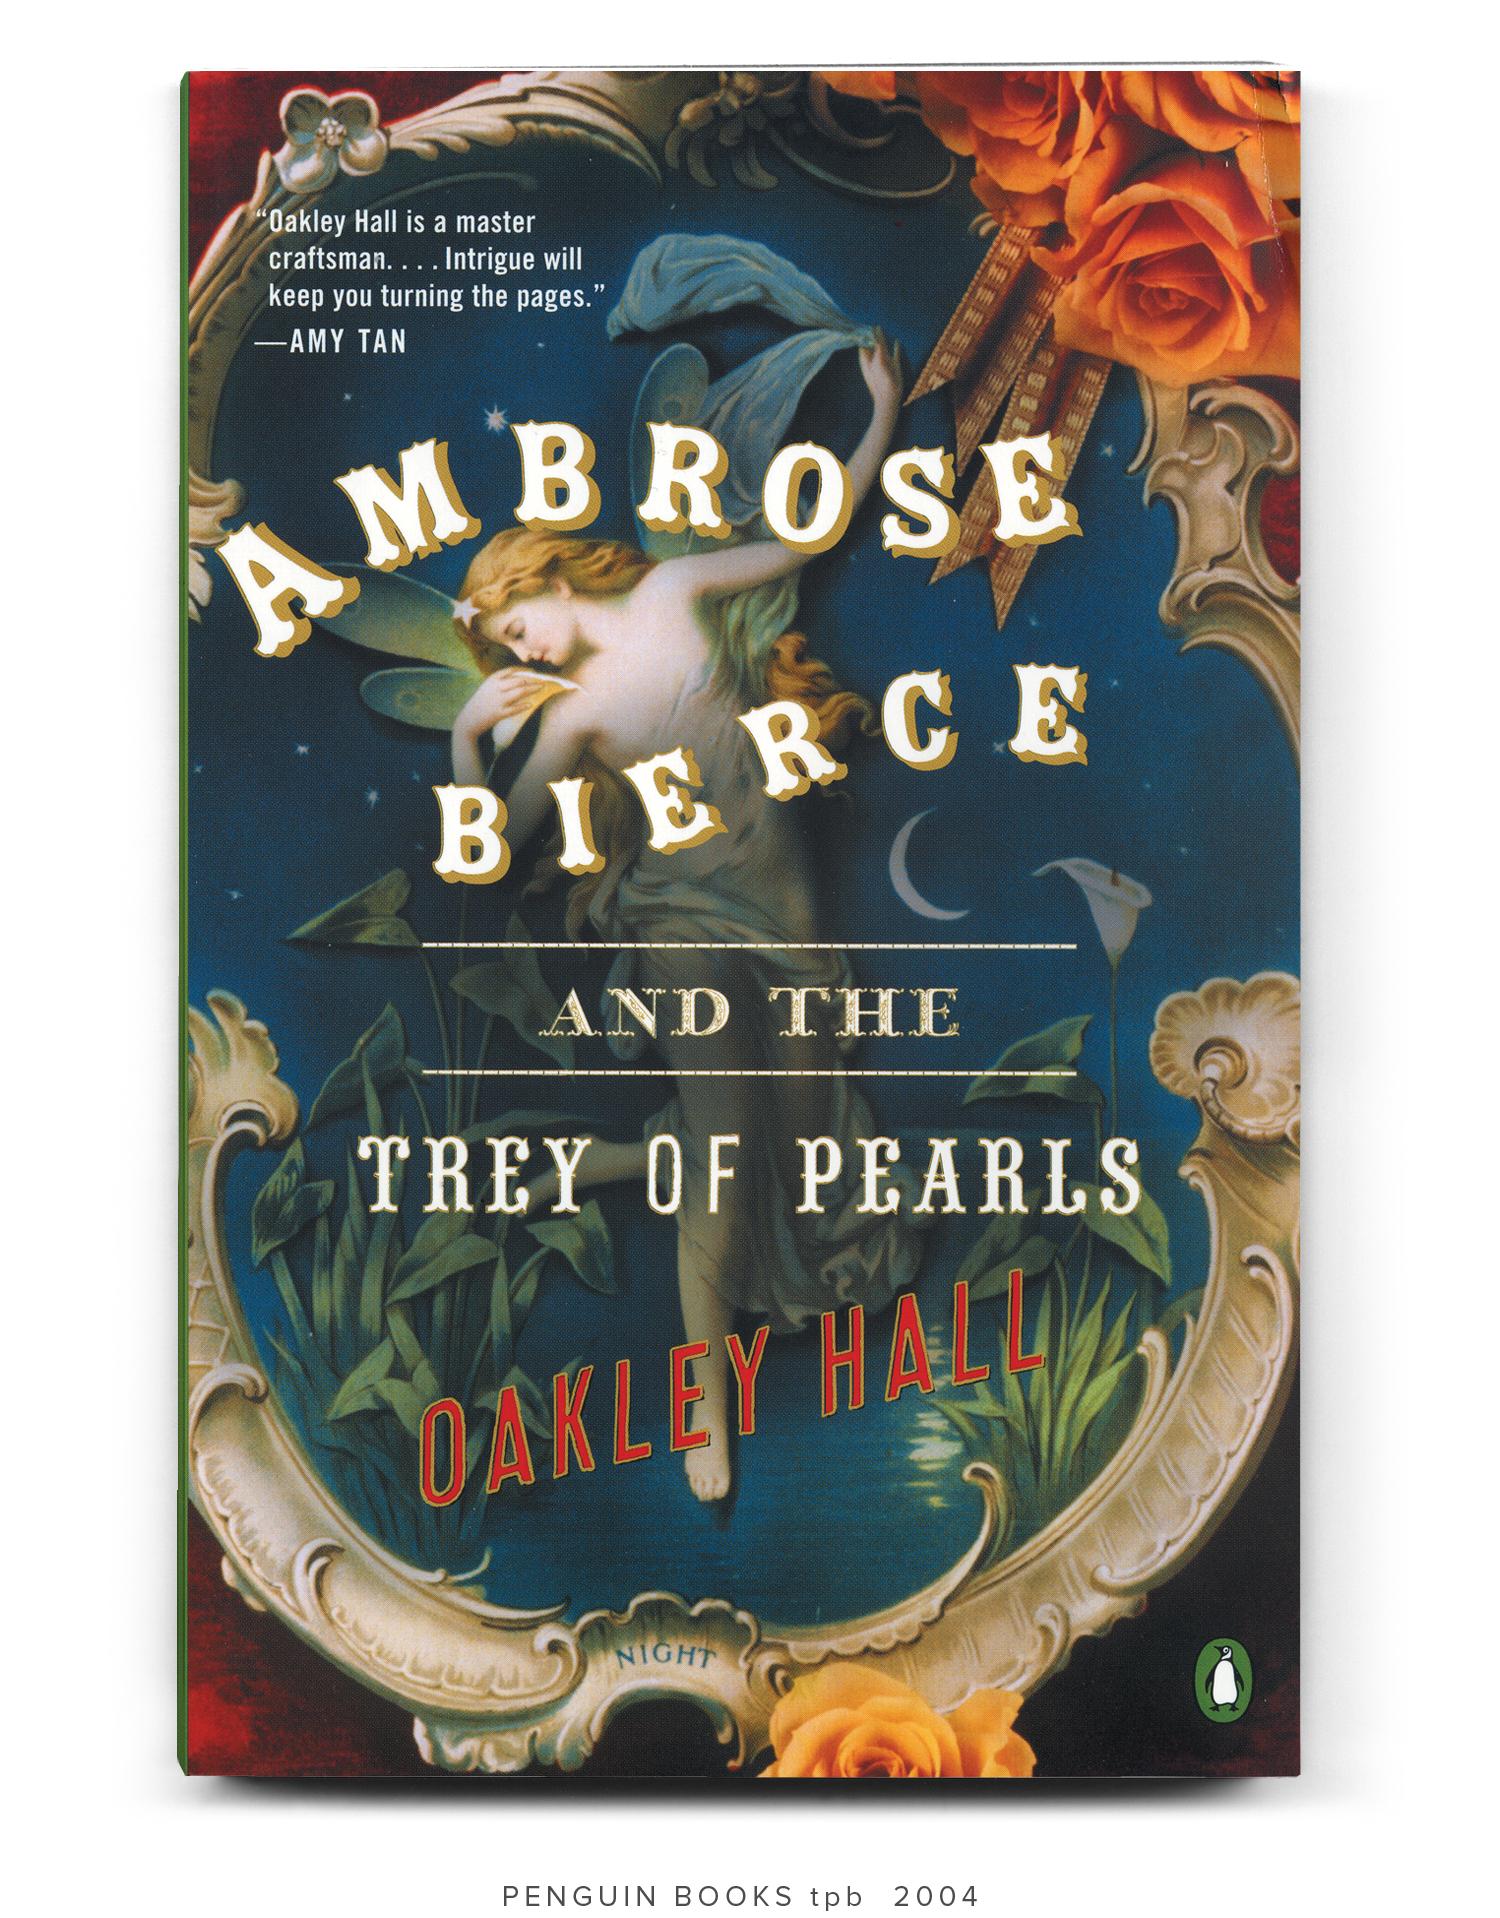 AMBROSE-BIERCE-AND-THE-TREY-OF-PEARLS-tpb-ss6.jpg